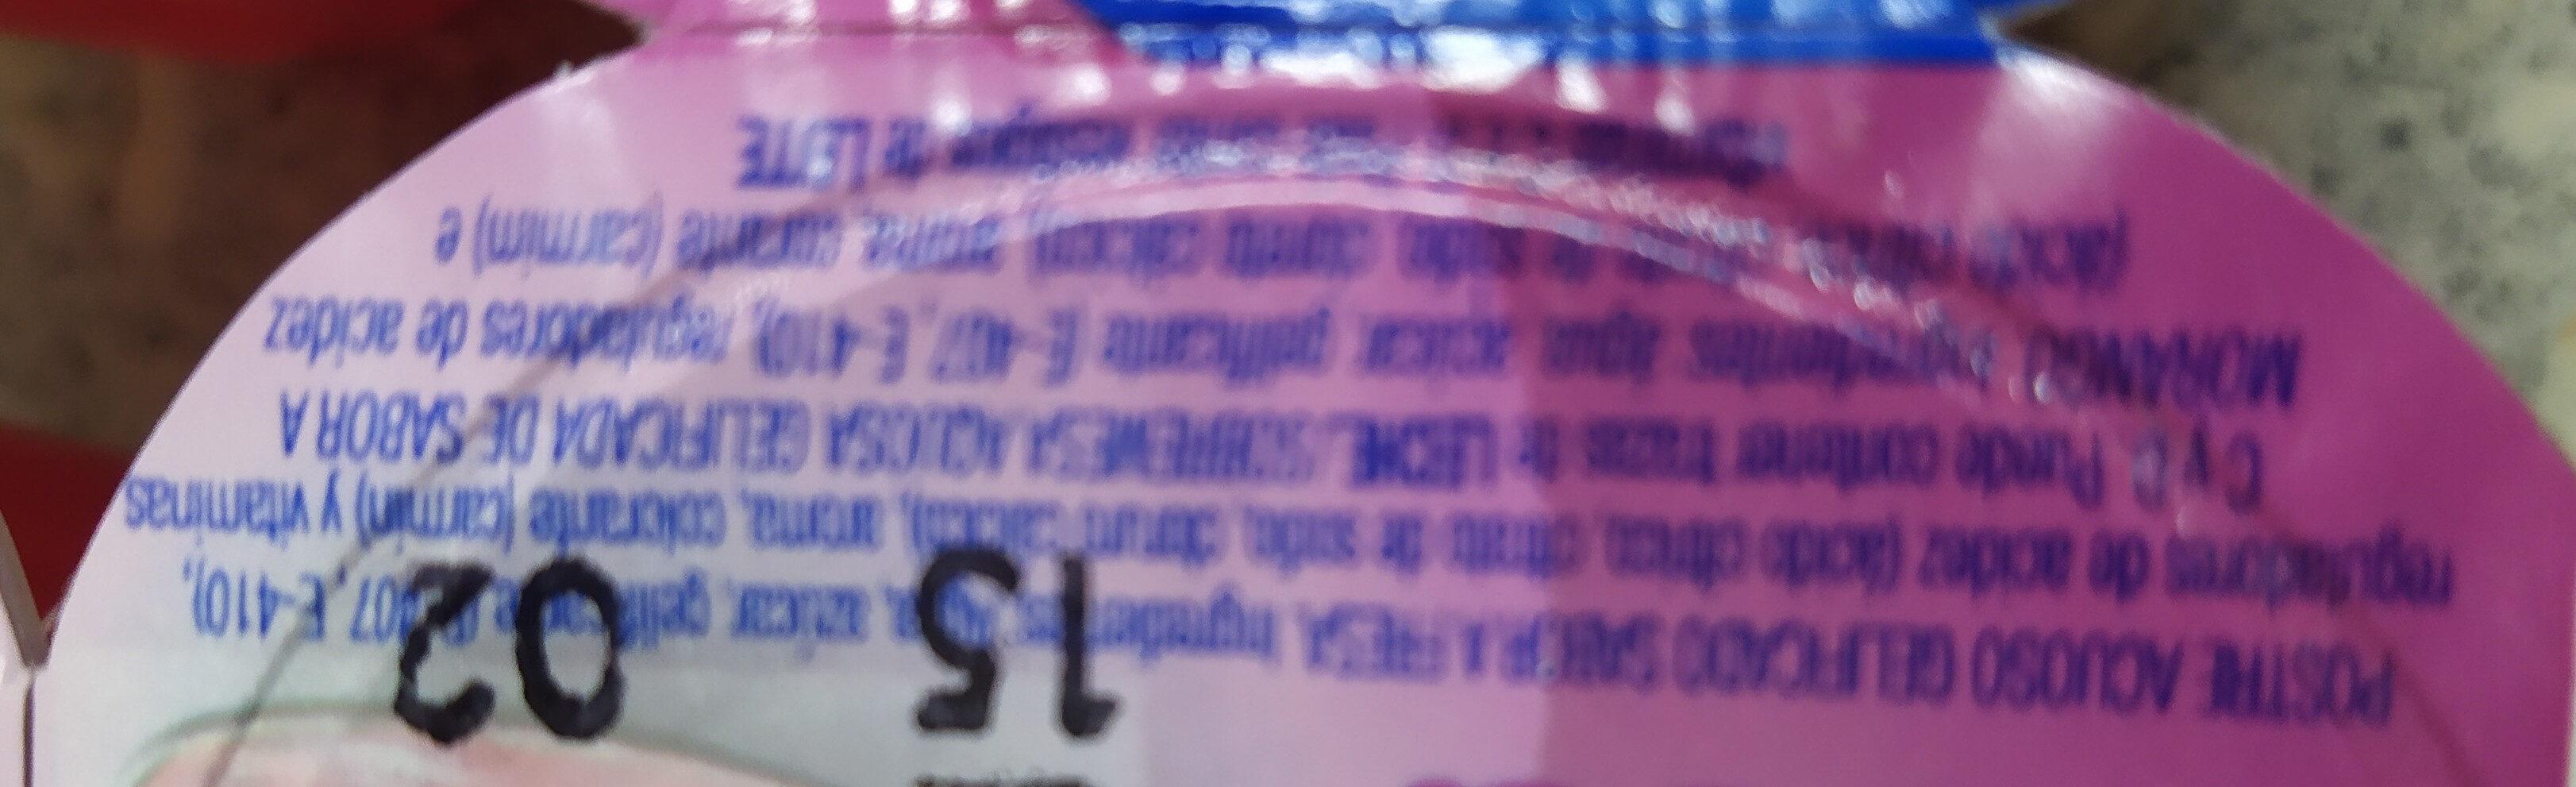 Gelatina Clesa sabor fresa - Ingredienti - es